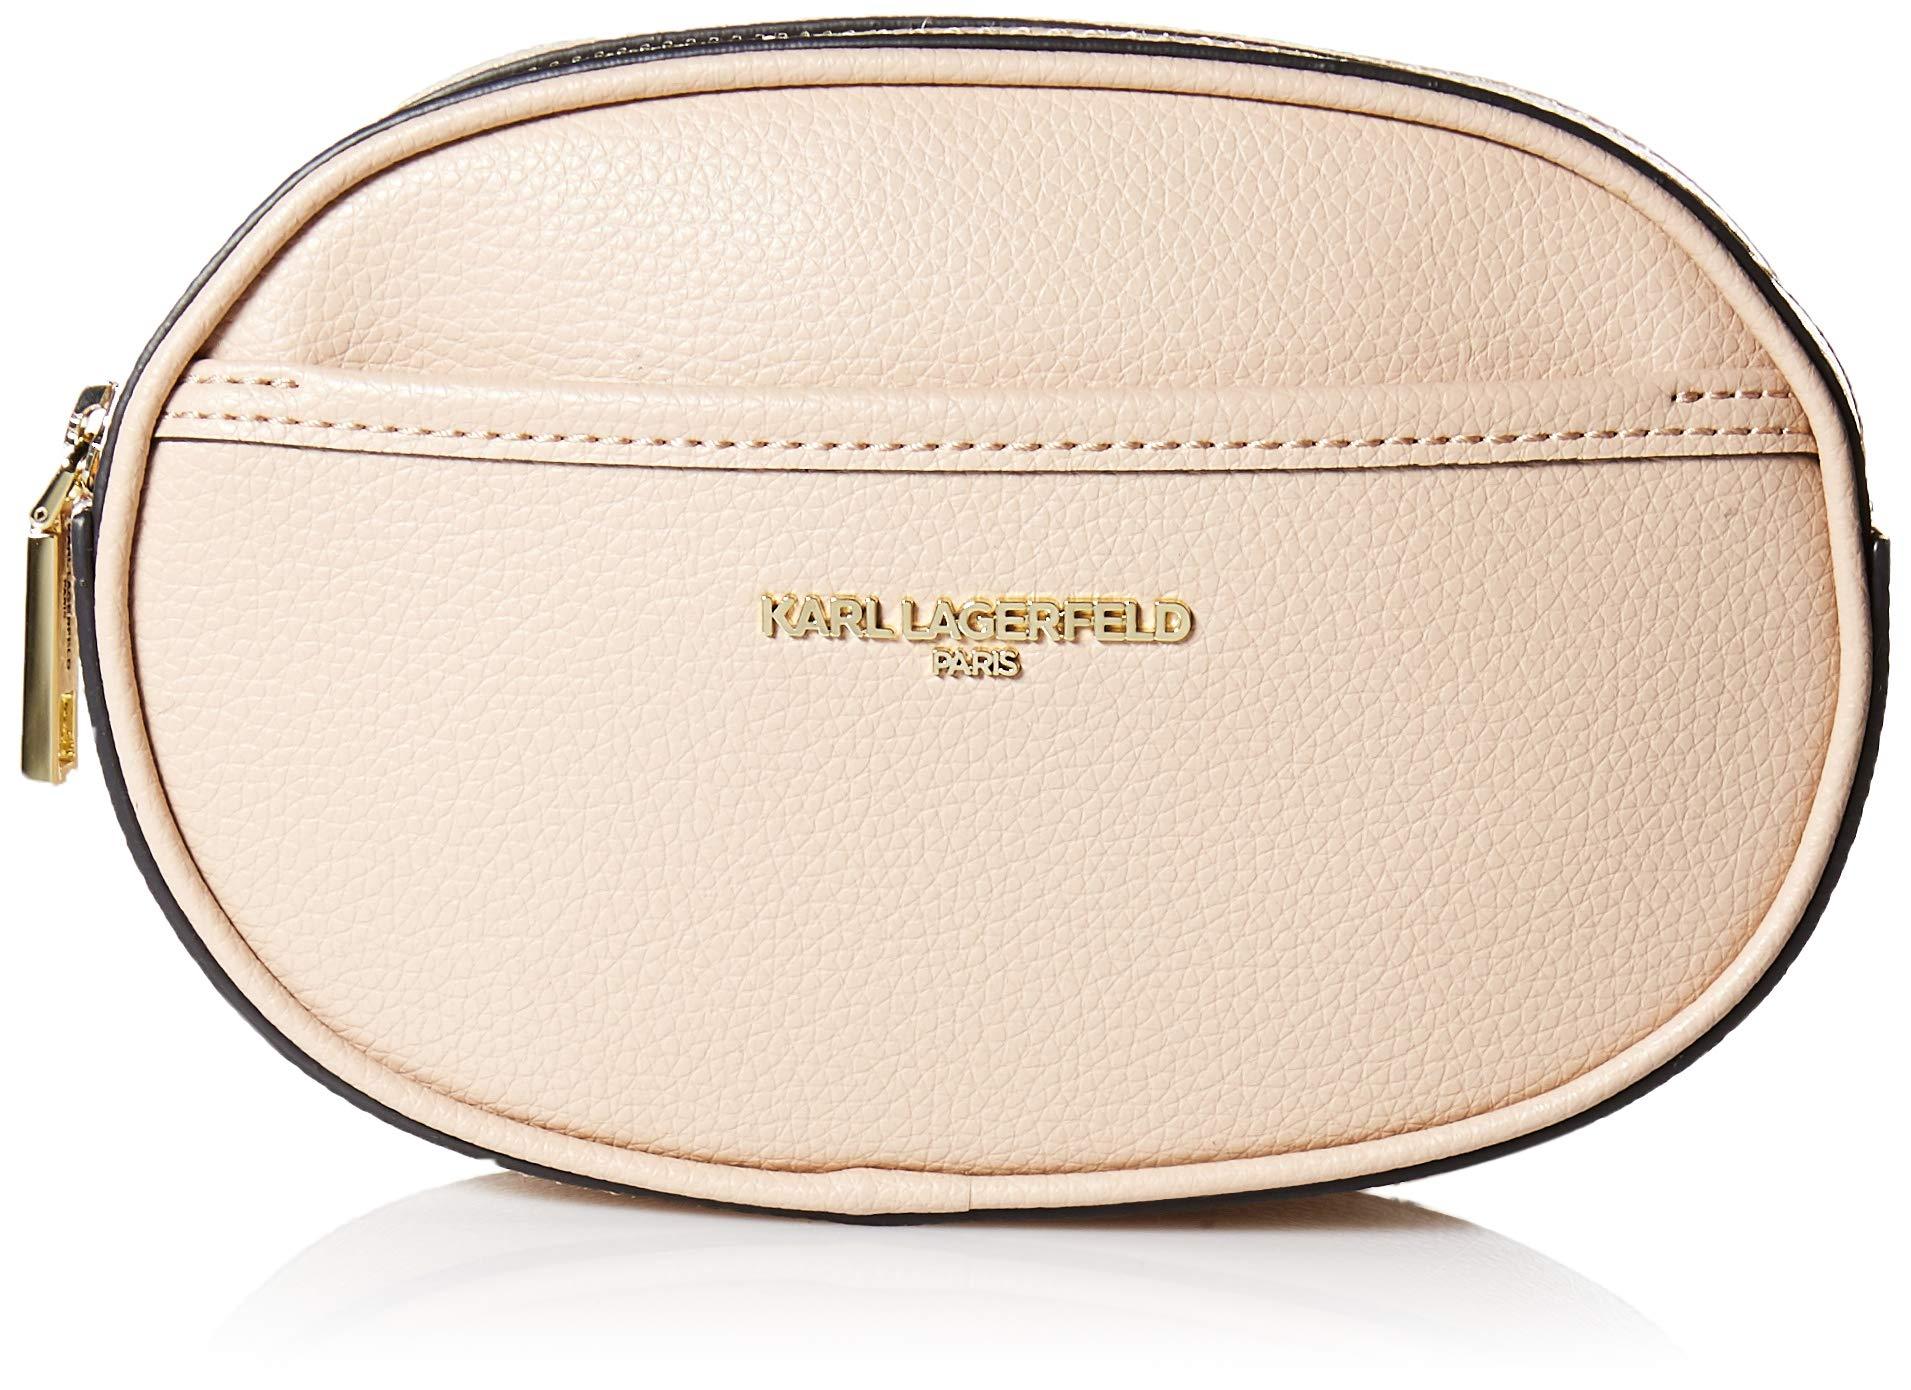 Karl Lagerfeld Paris Womens Willow Belt Bag, Shell